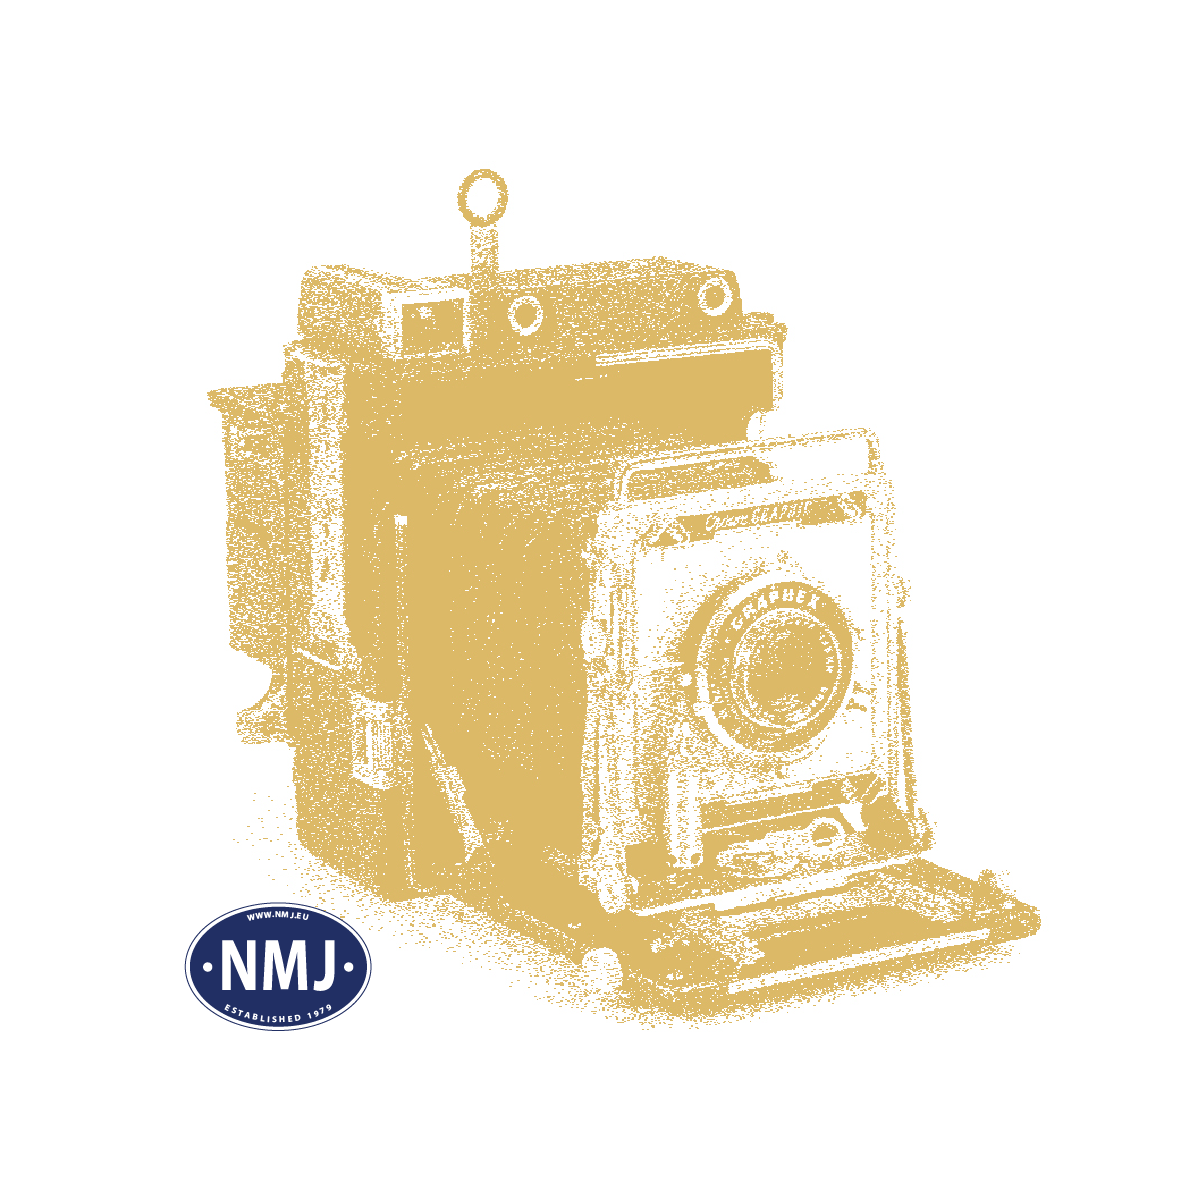 NMJ0.21509 - NMJ Superline Modell des Personen/Gepäckwagens BF10.21509 der NSB, Spur 0